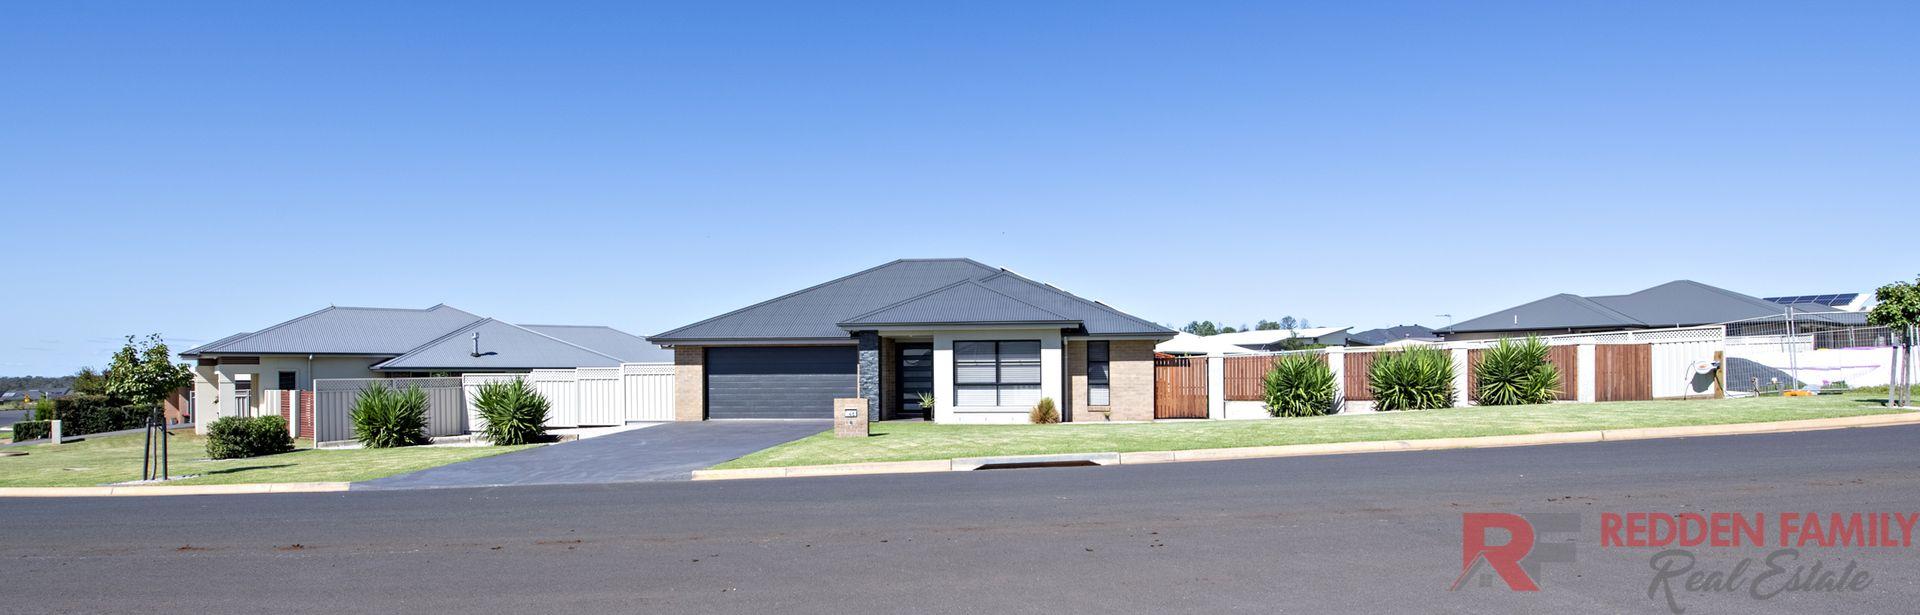 48 Champagne Drive, Dubbo NSW 2830, Image 0